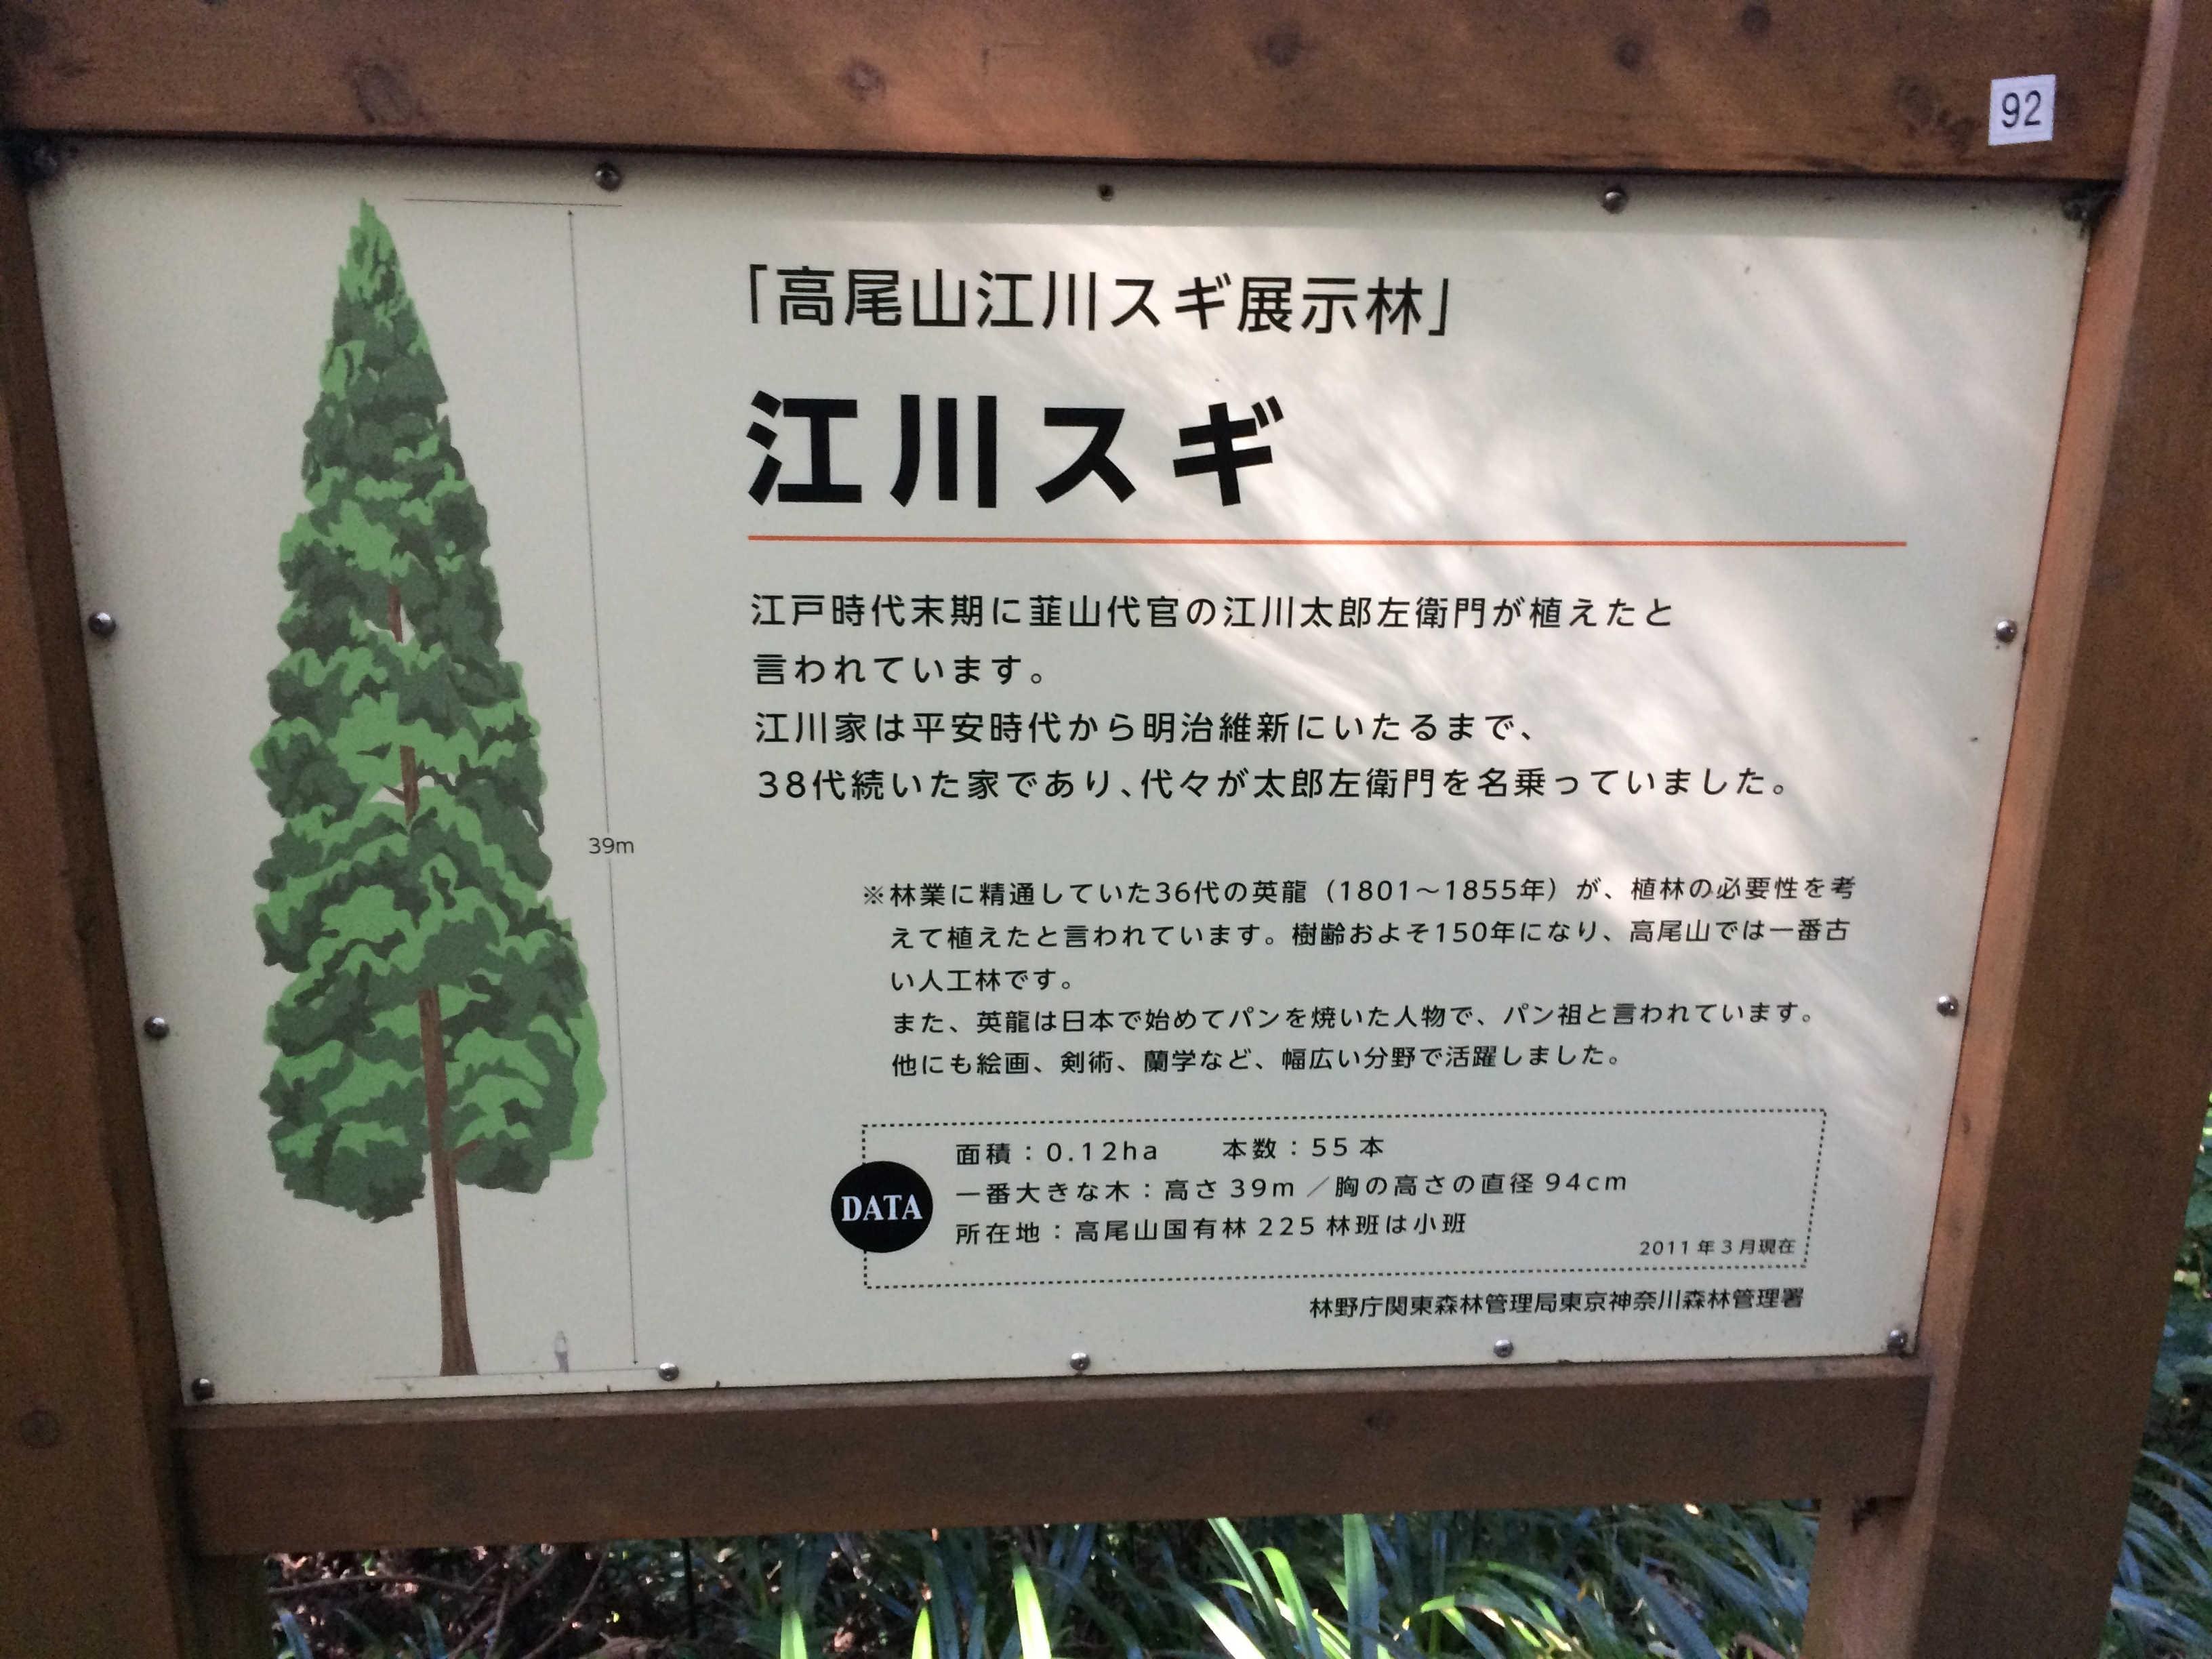 「高尾山江川スギ展示林」江川スギ